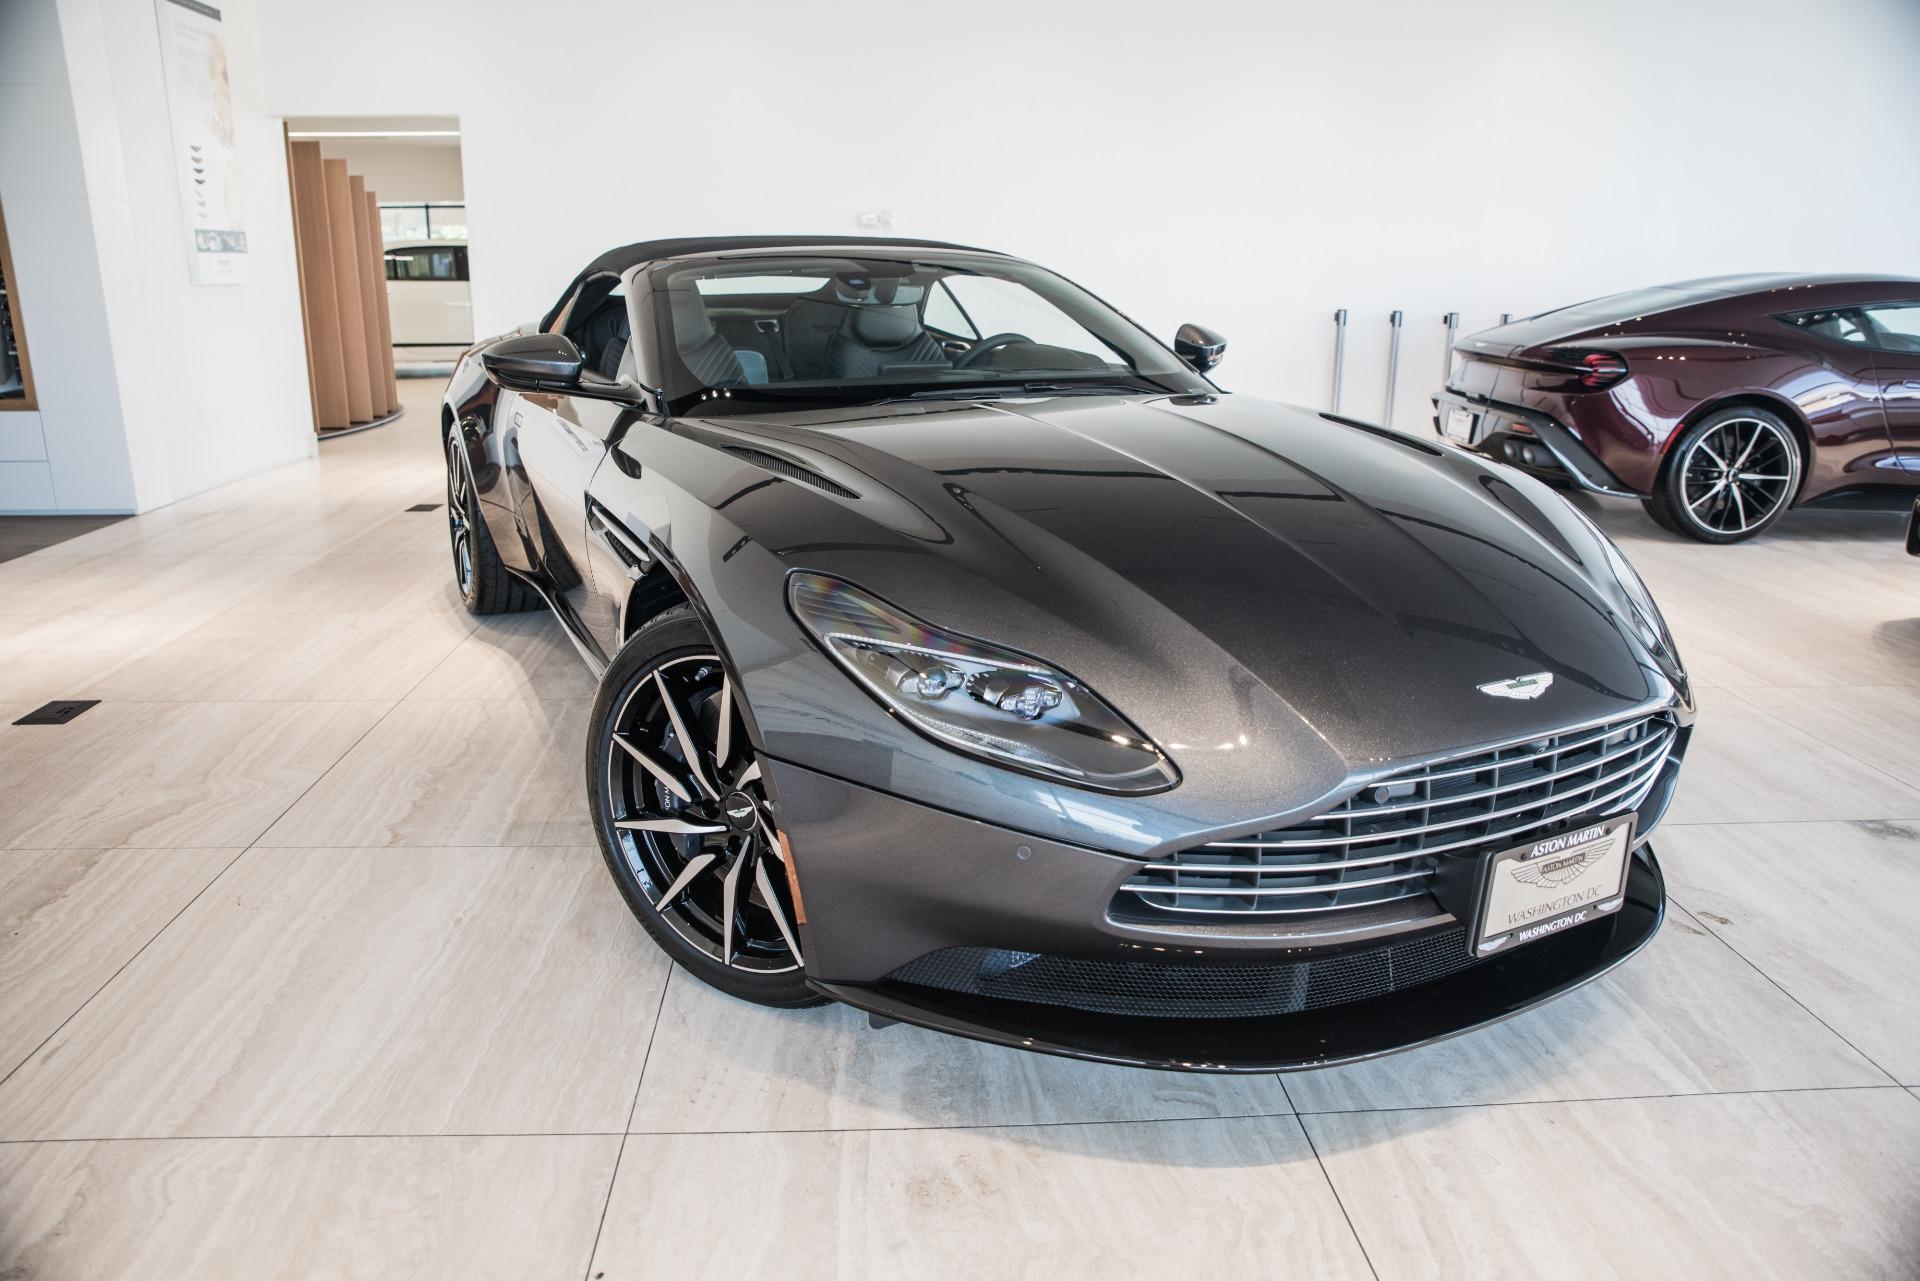 2020 Aston Martin Db11 Volante Stock 20nm08579 For Sale Near Vienna Va Va Aston Martin Dealer